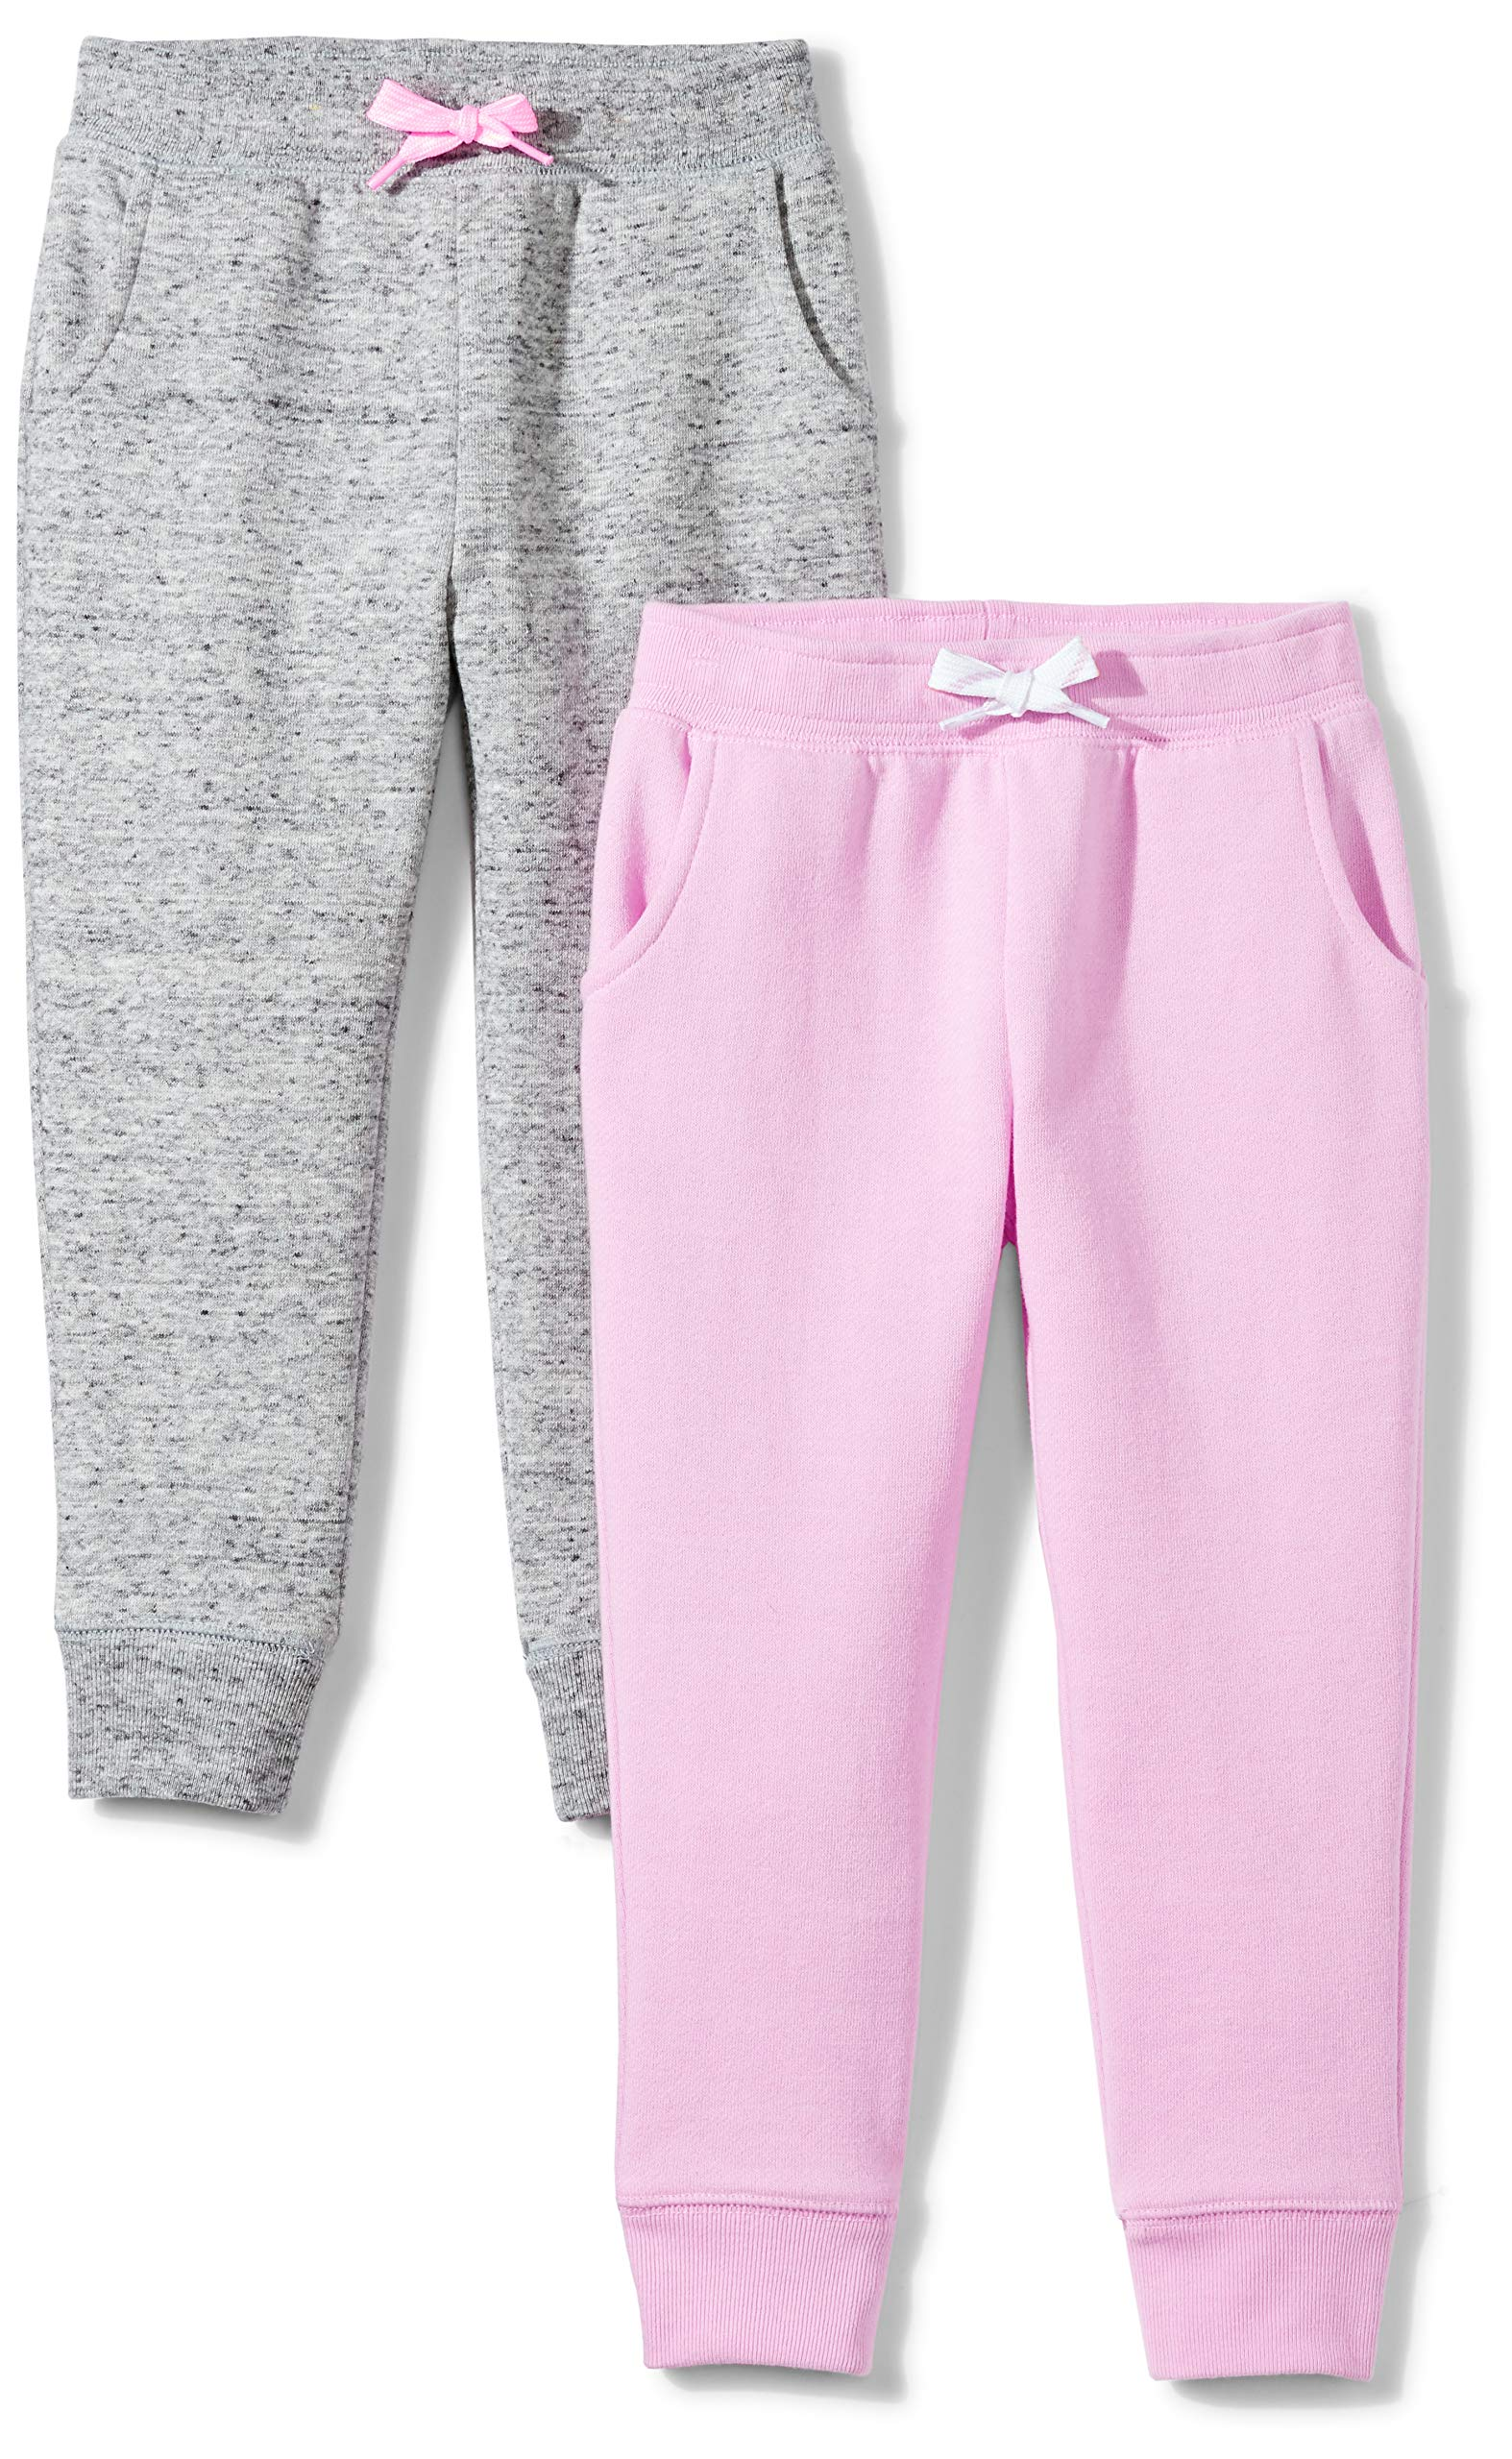 Spotted Zebra Girls' Big 2-Pack Fleece Jogger Pants, Grey/Pink, Medium (8)